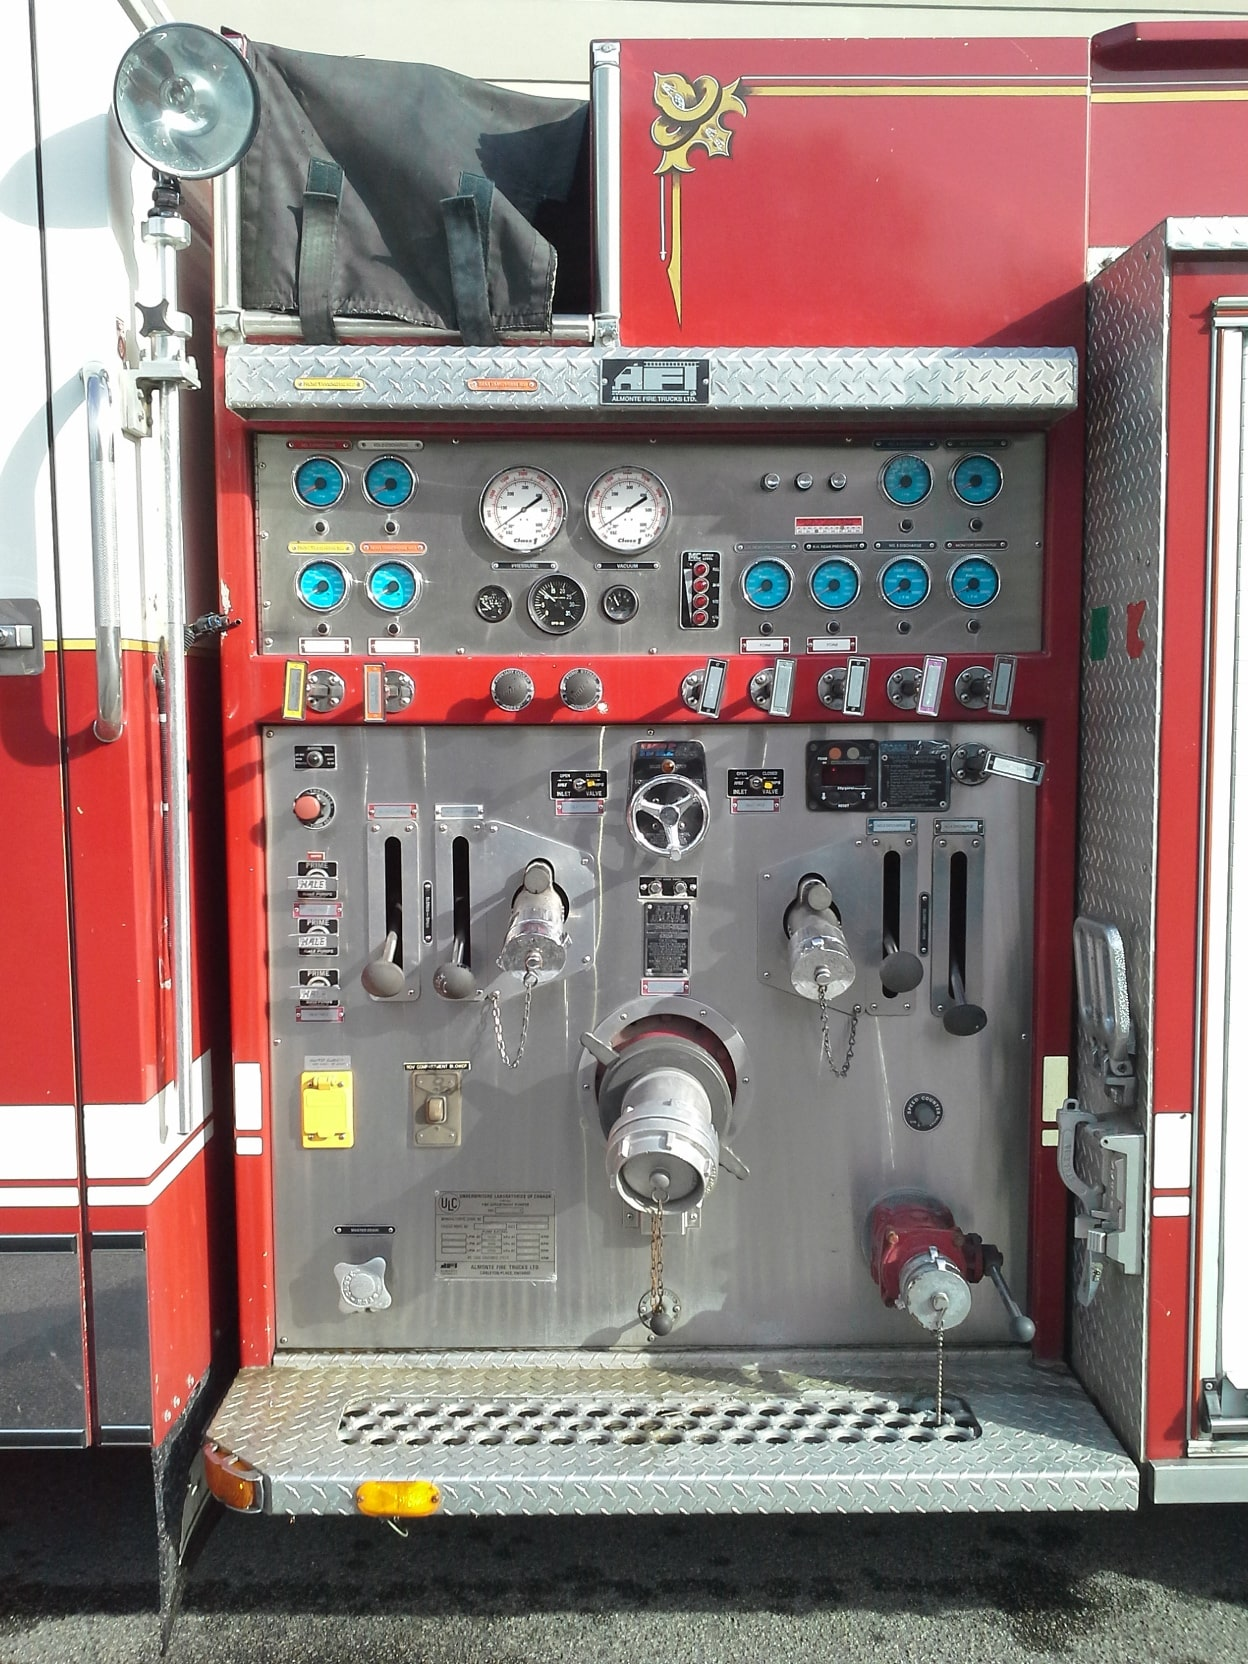 Spartan Fire Pump Diagram Data Schema Engine Centrifugal Cutaway 1995 Pumper Bpfa0147 On Hold Palmetto Hale